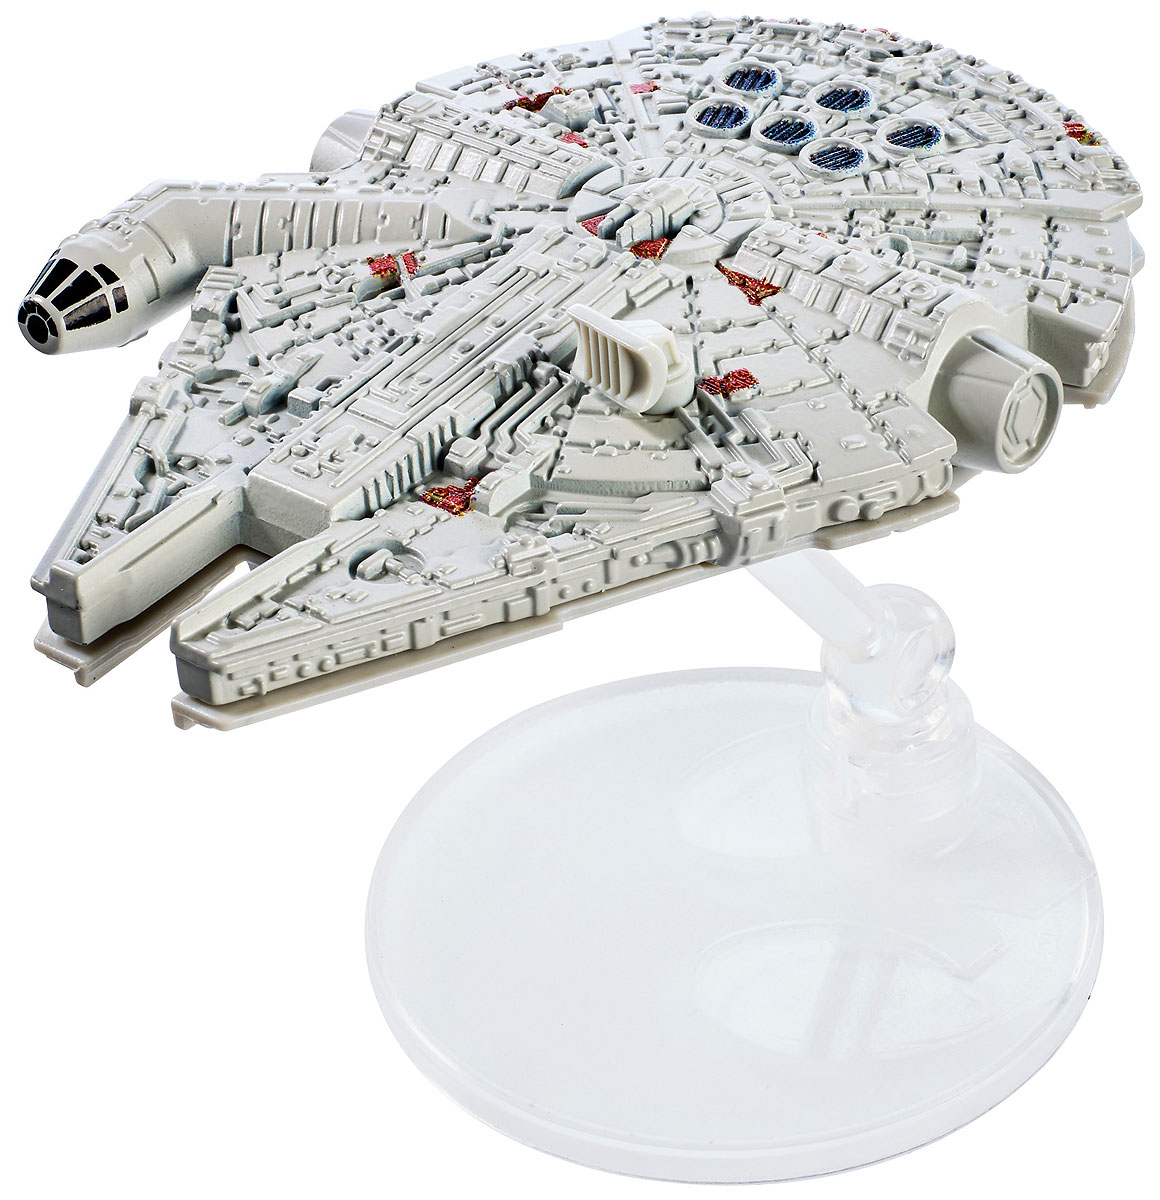 Hot Wheels Star Wars Космический корабль Millennium Falcon - Транспорт, машинки